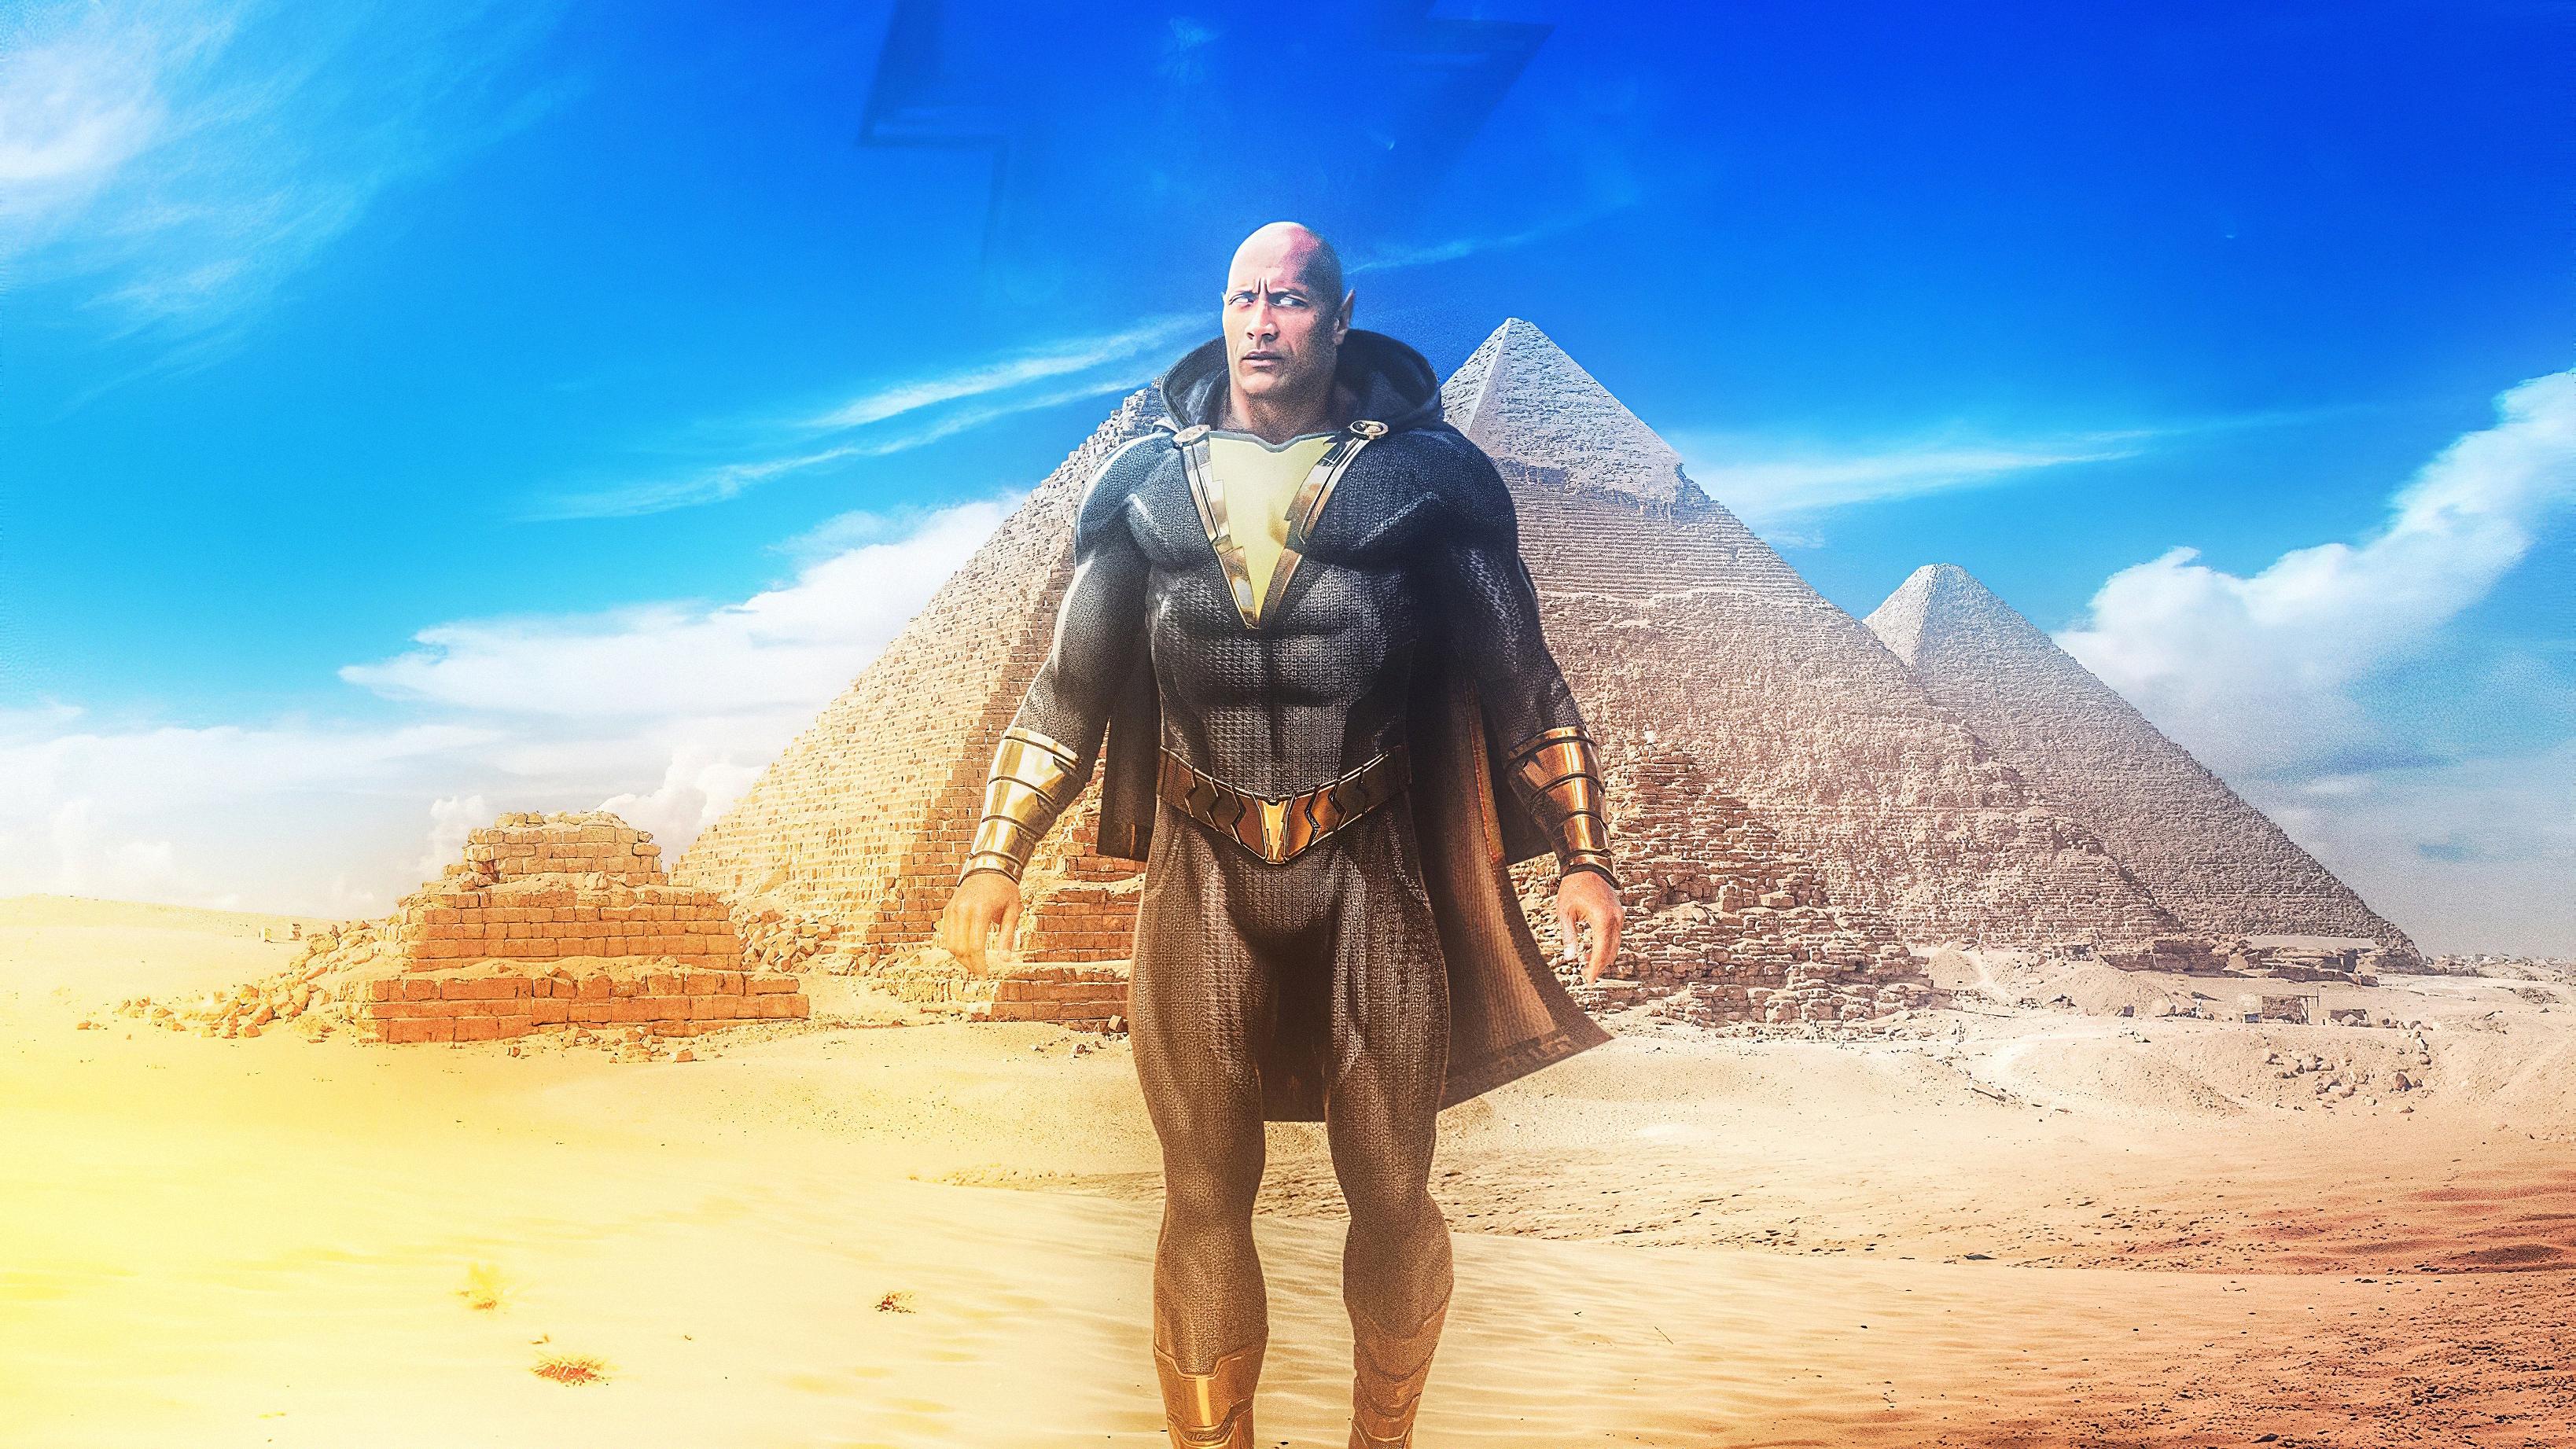 black adam rock hd superheroes 4k wallpapers images backgrounds photos and pictures black adam rock hd superheroes 4k